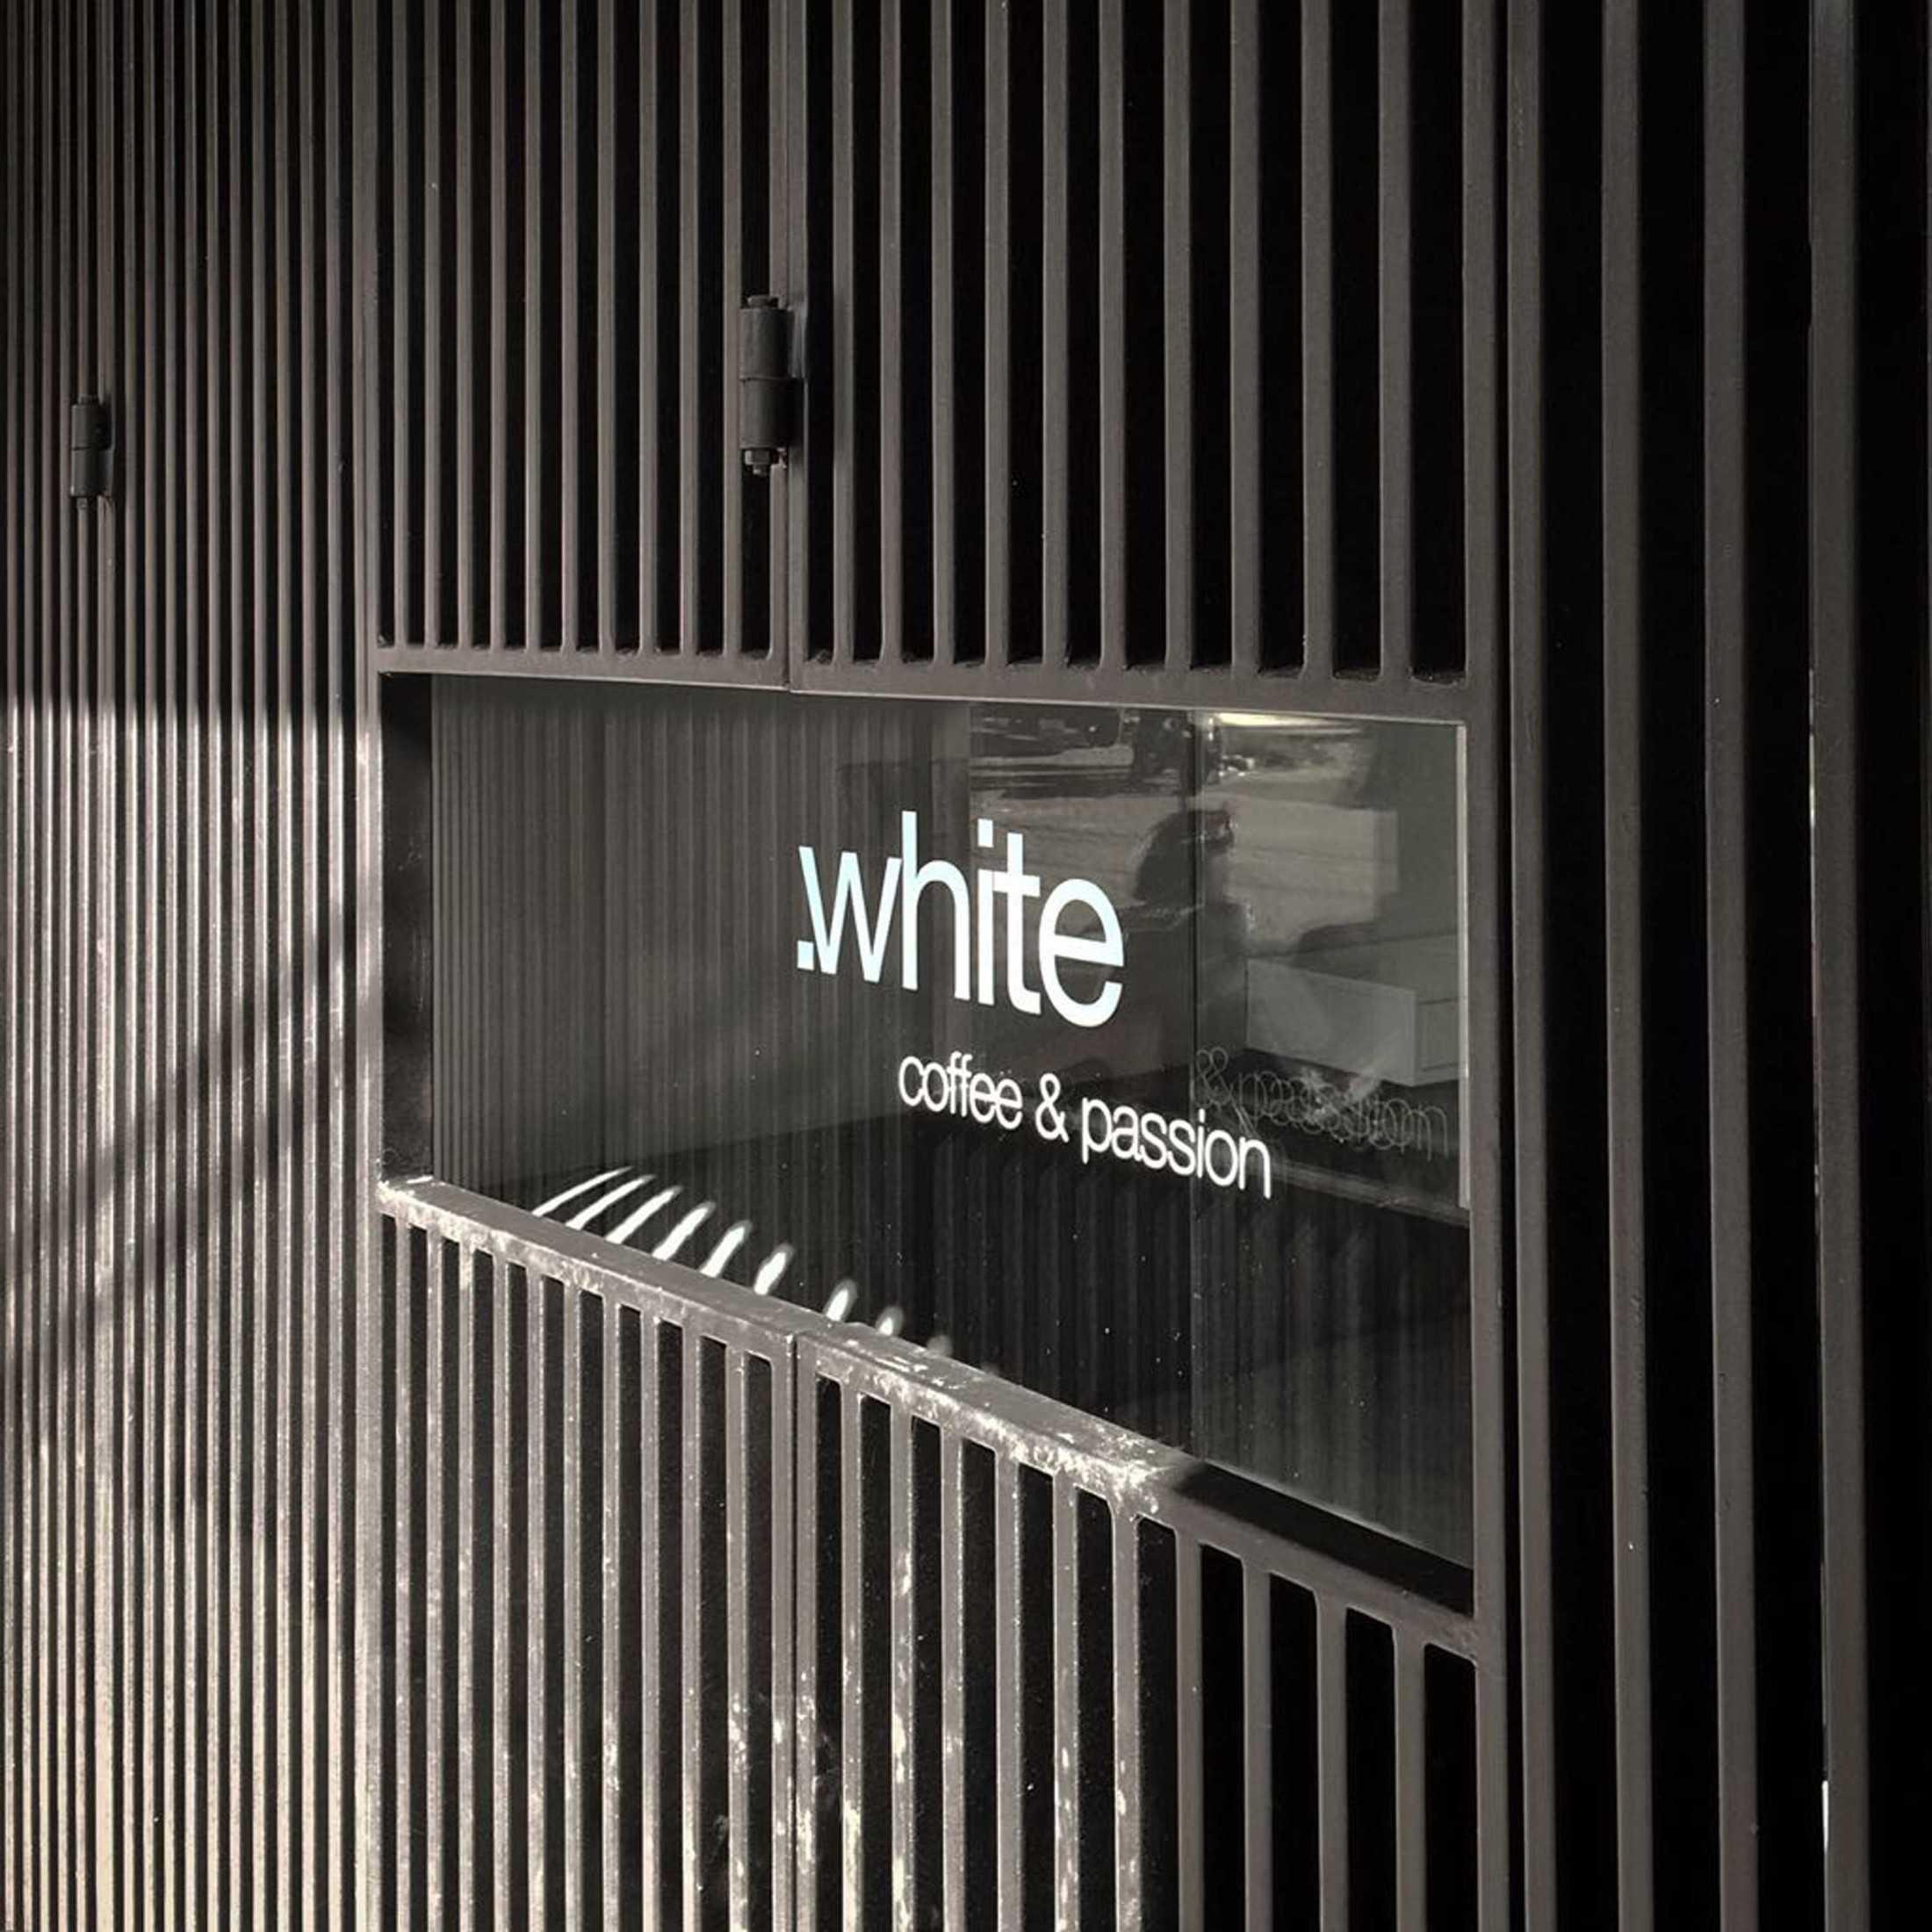 Ads Architect Kafe Kotak Putih Sentul Selatan Sentul Selatan Ads-Architect-Kafe-Kotak-Putih  53513